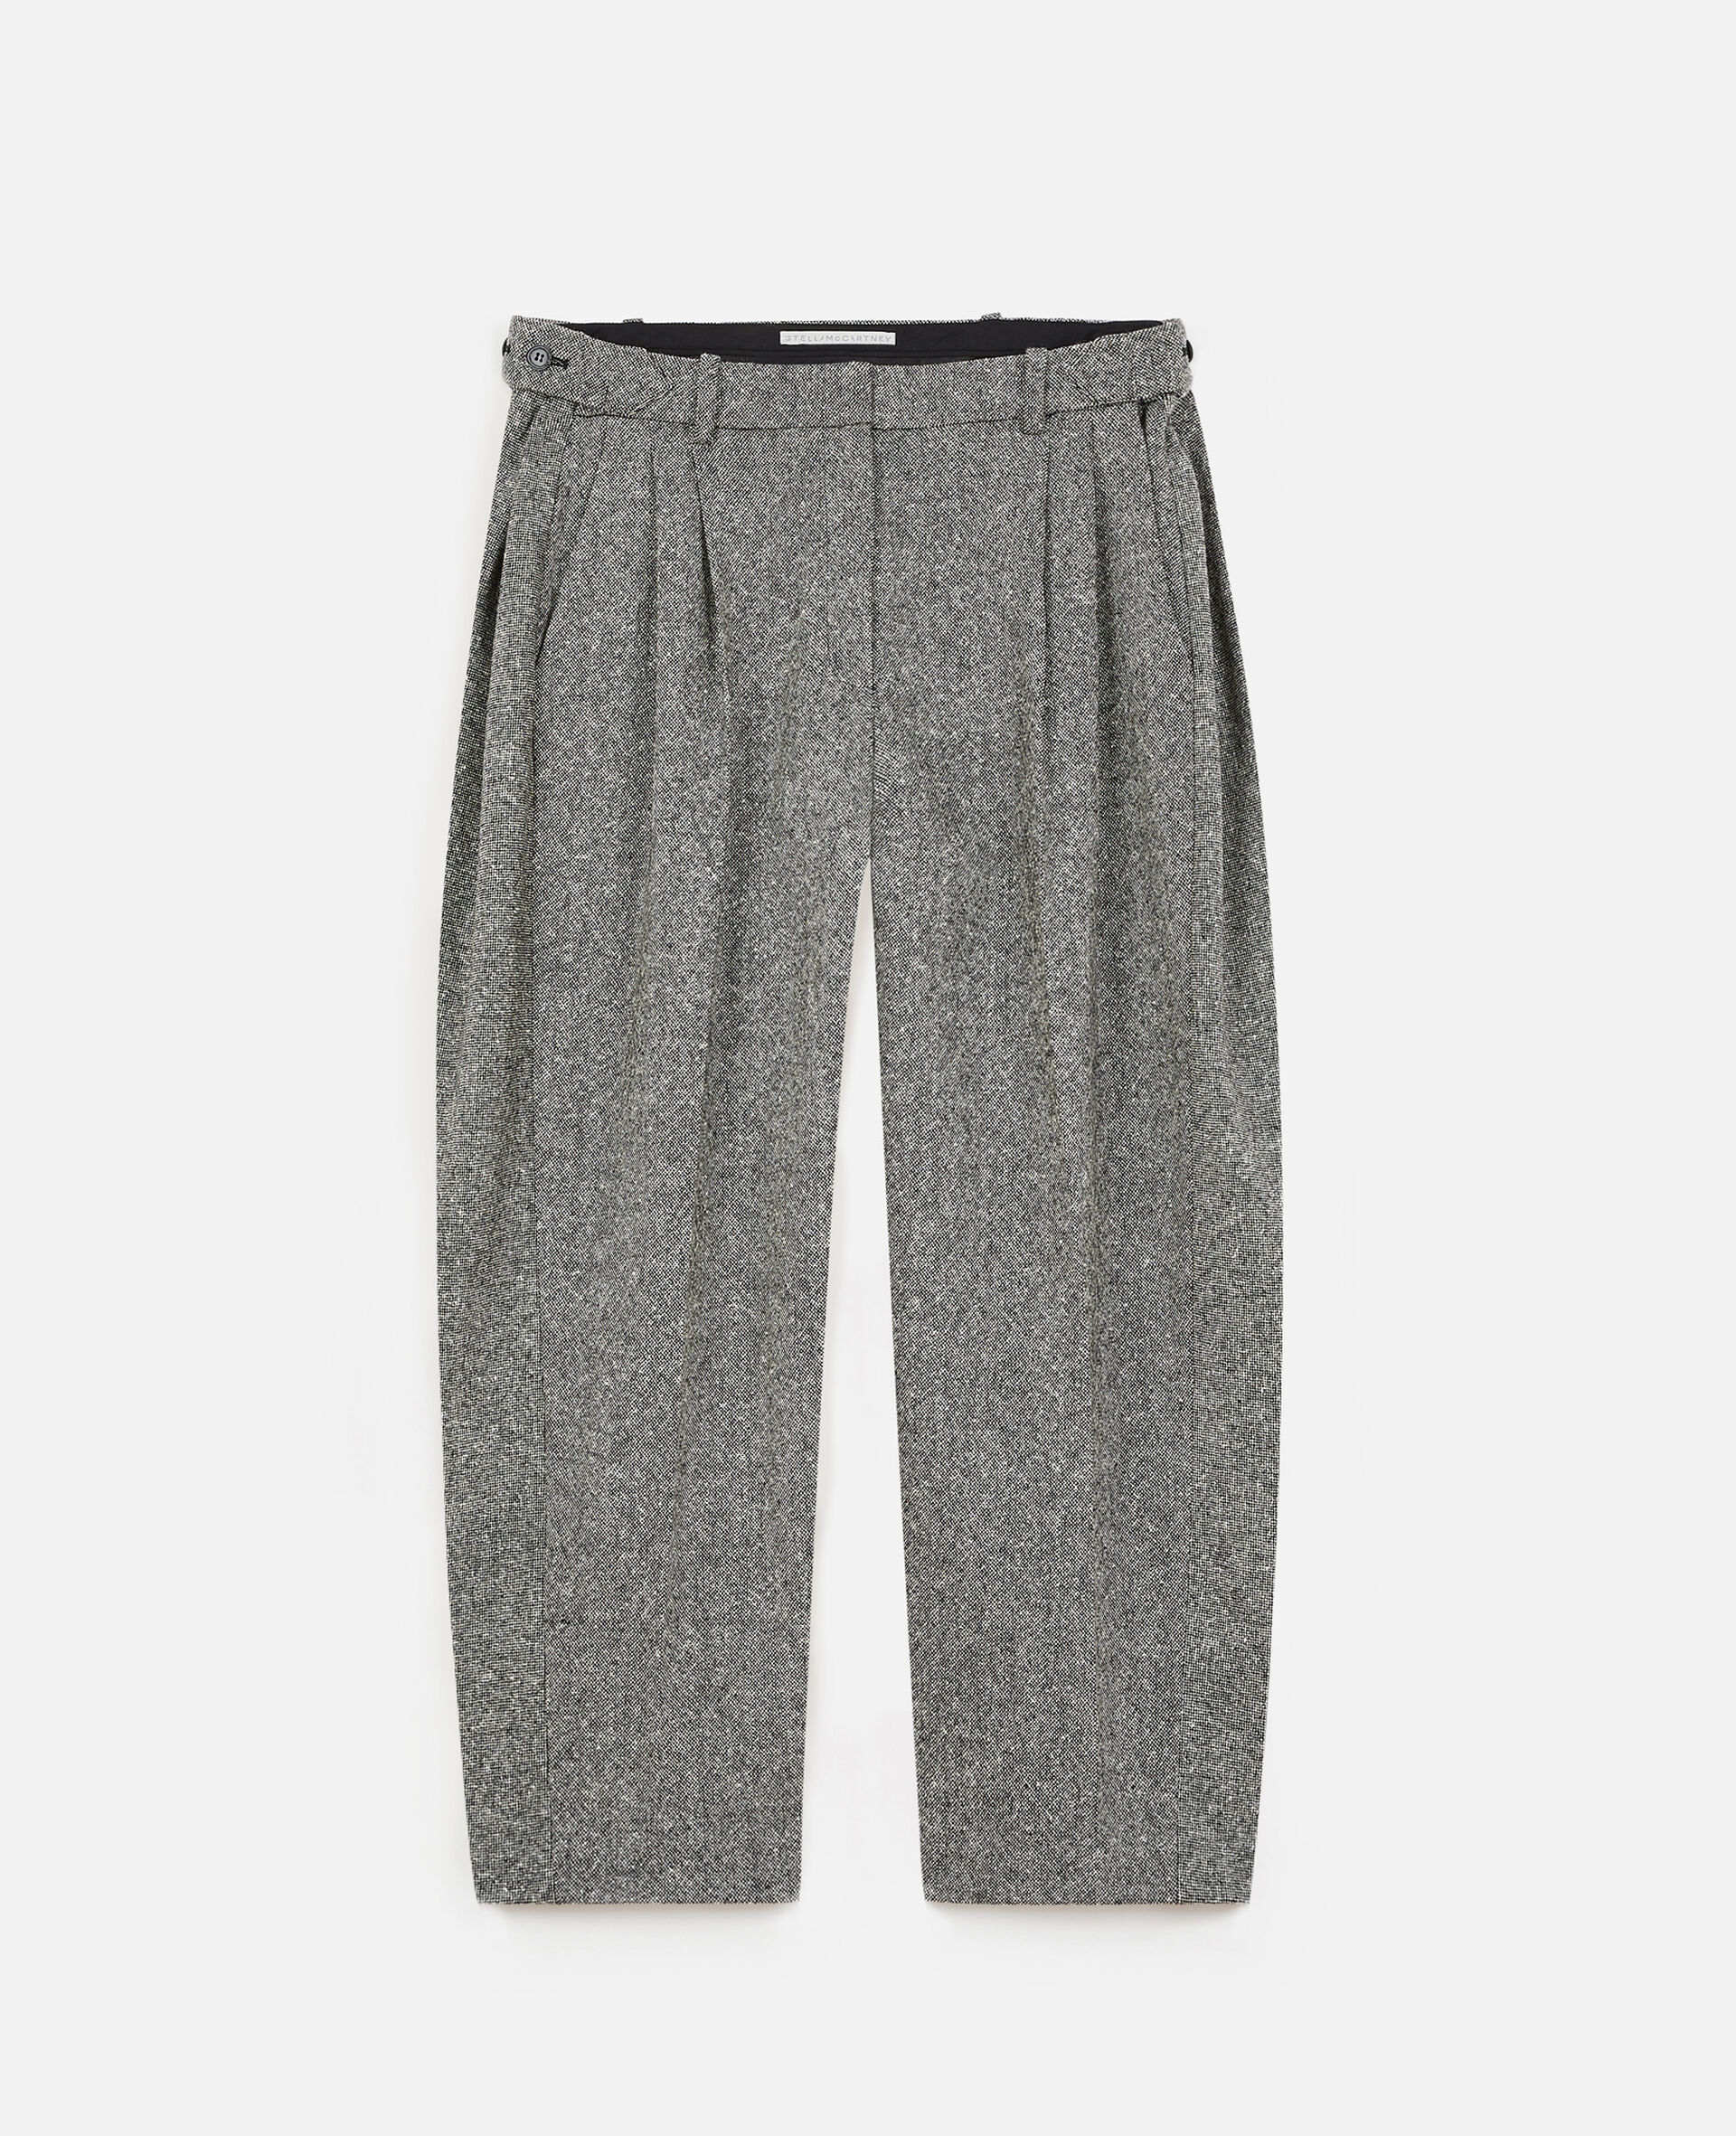 Hose aus Wolle Dawson-Grau-large image number 0